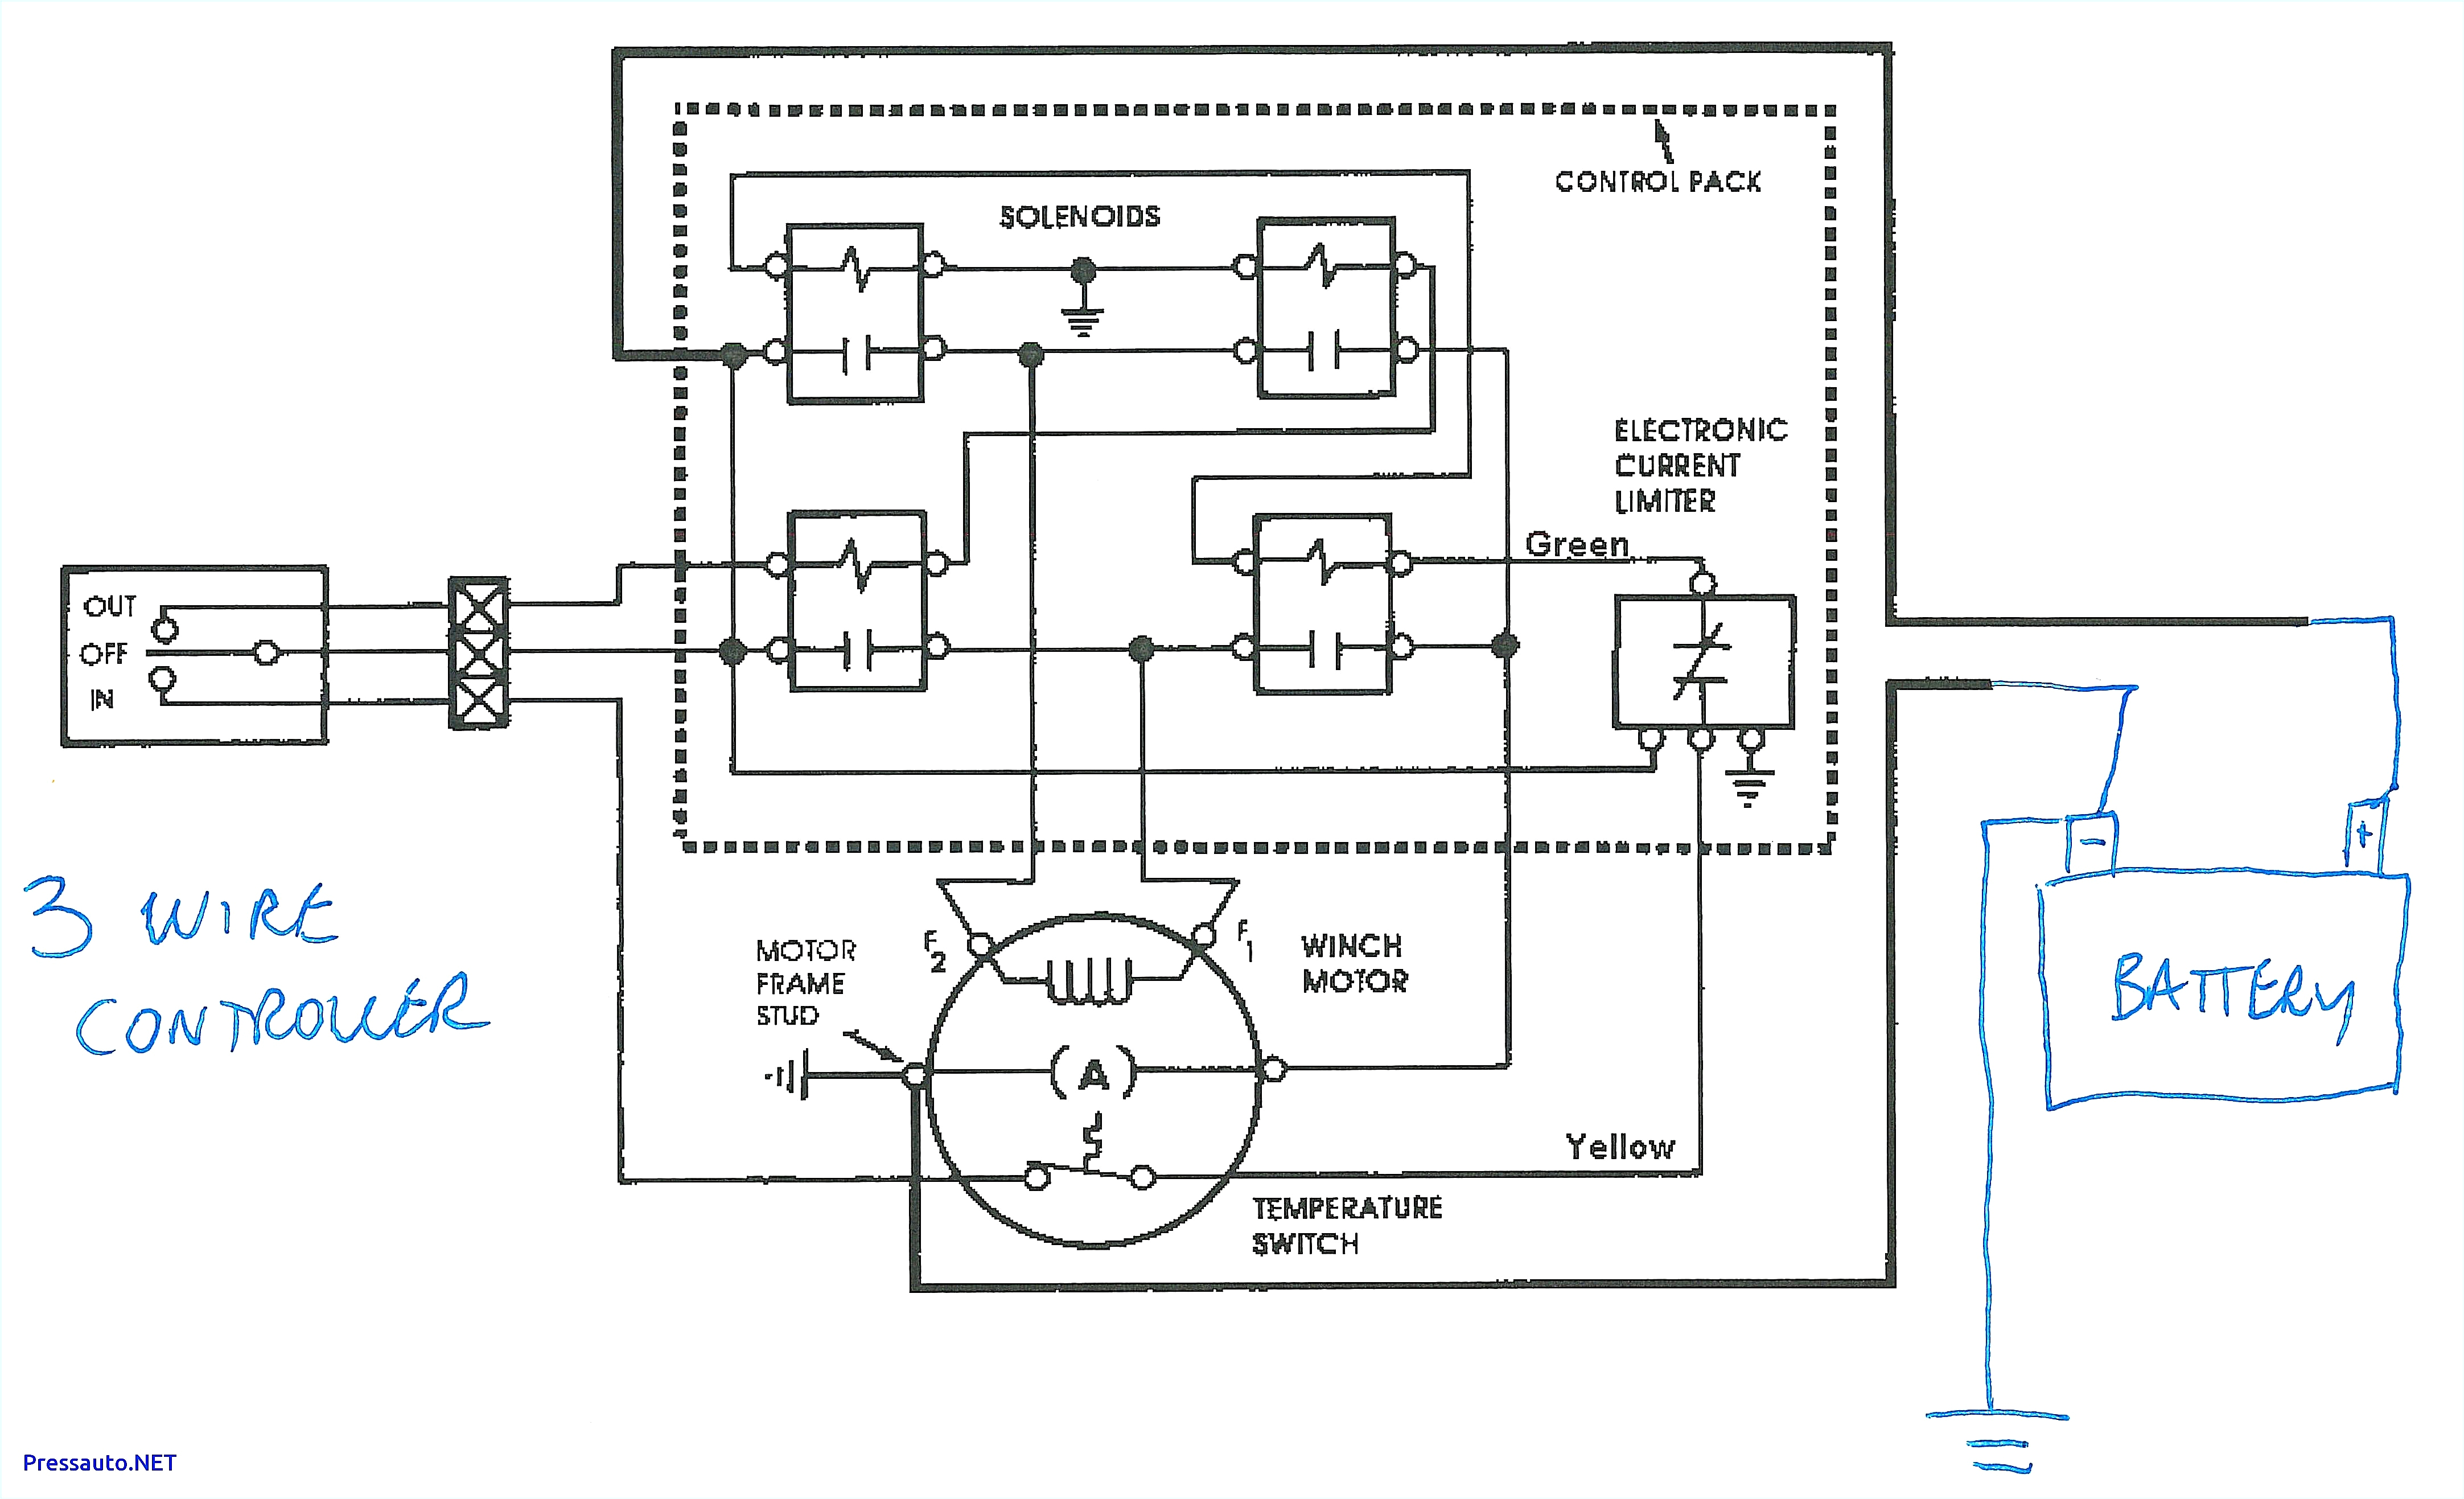 warn winch solenoid wiring wiring diagrams polaris warn atv winch wiring diagram warn atv wiring diagram